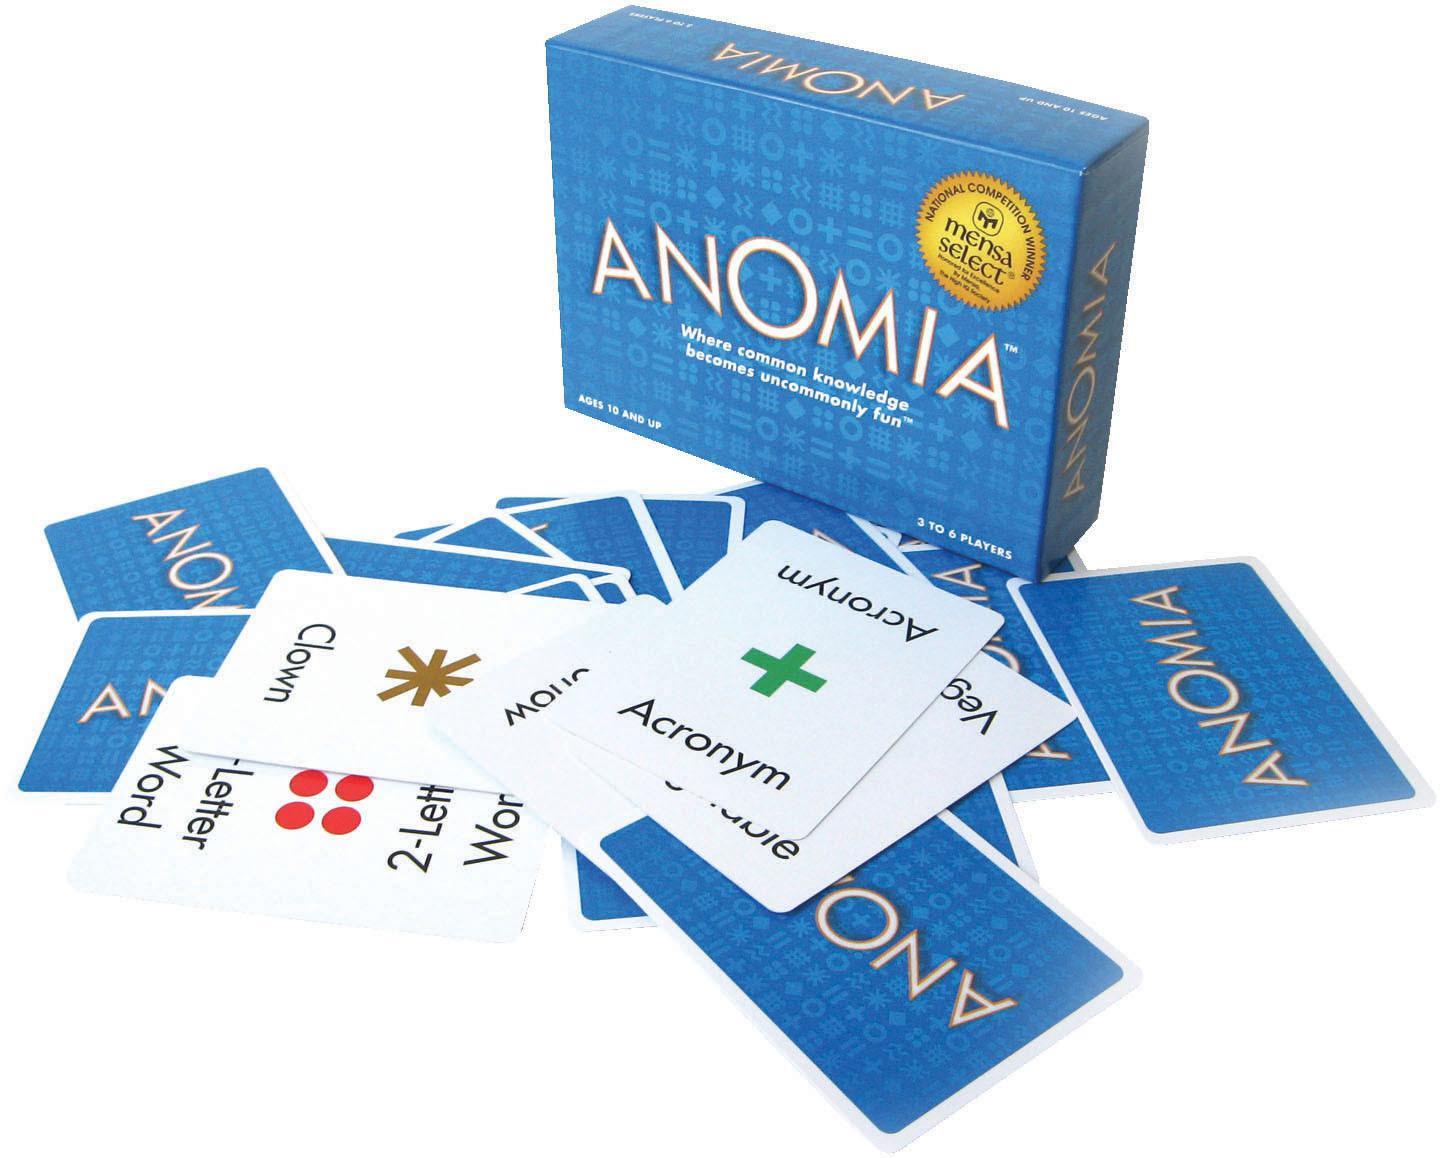 [30 mins] Anomia